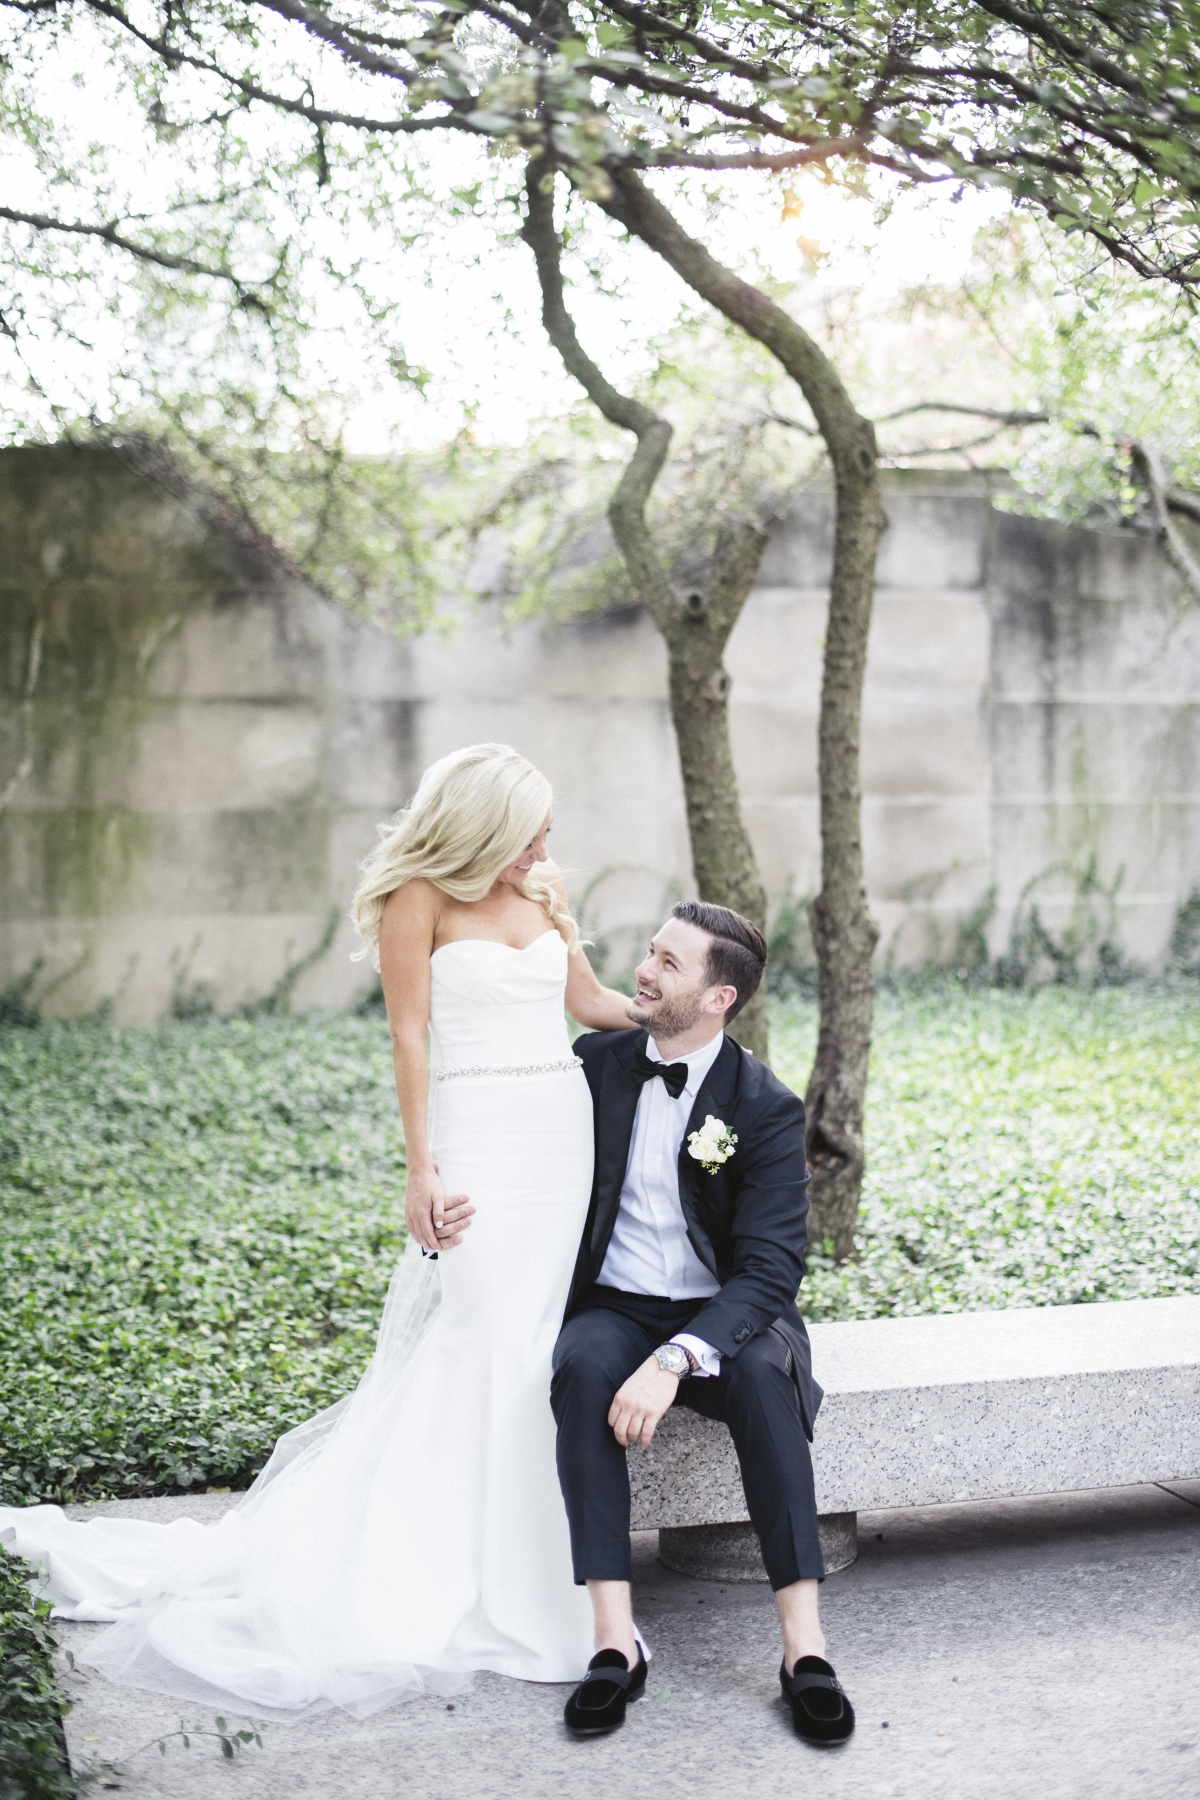 Chicago Wedding Photos at the Art Institute